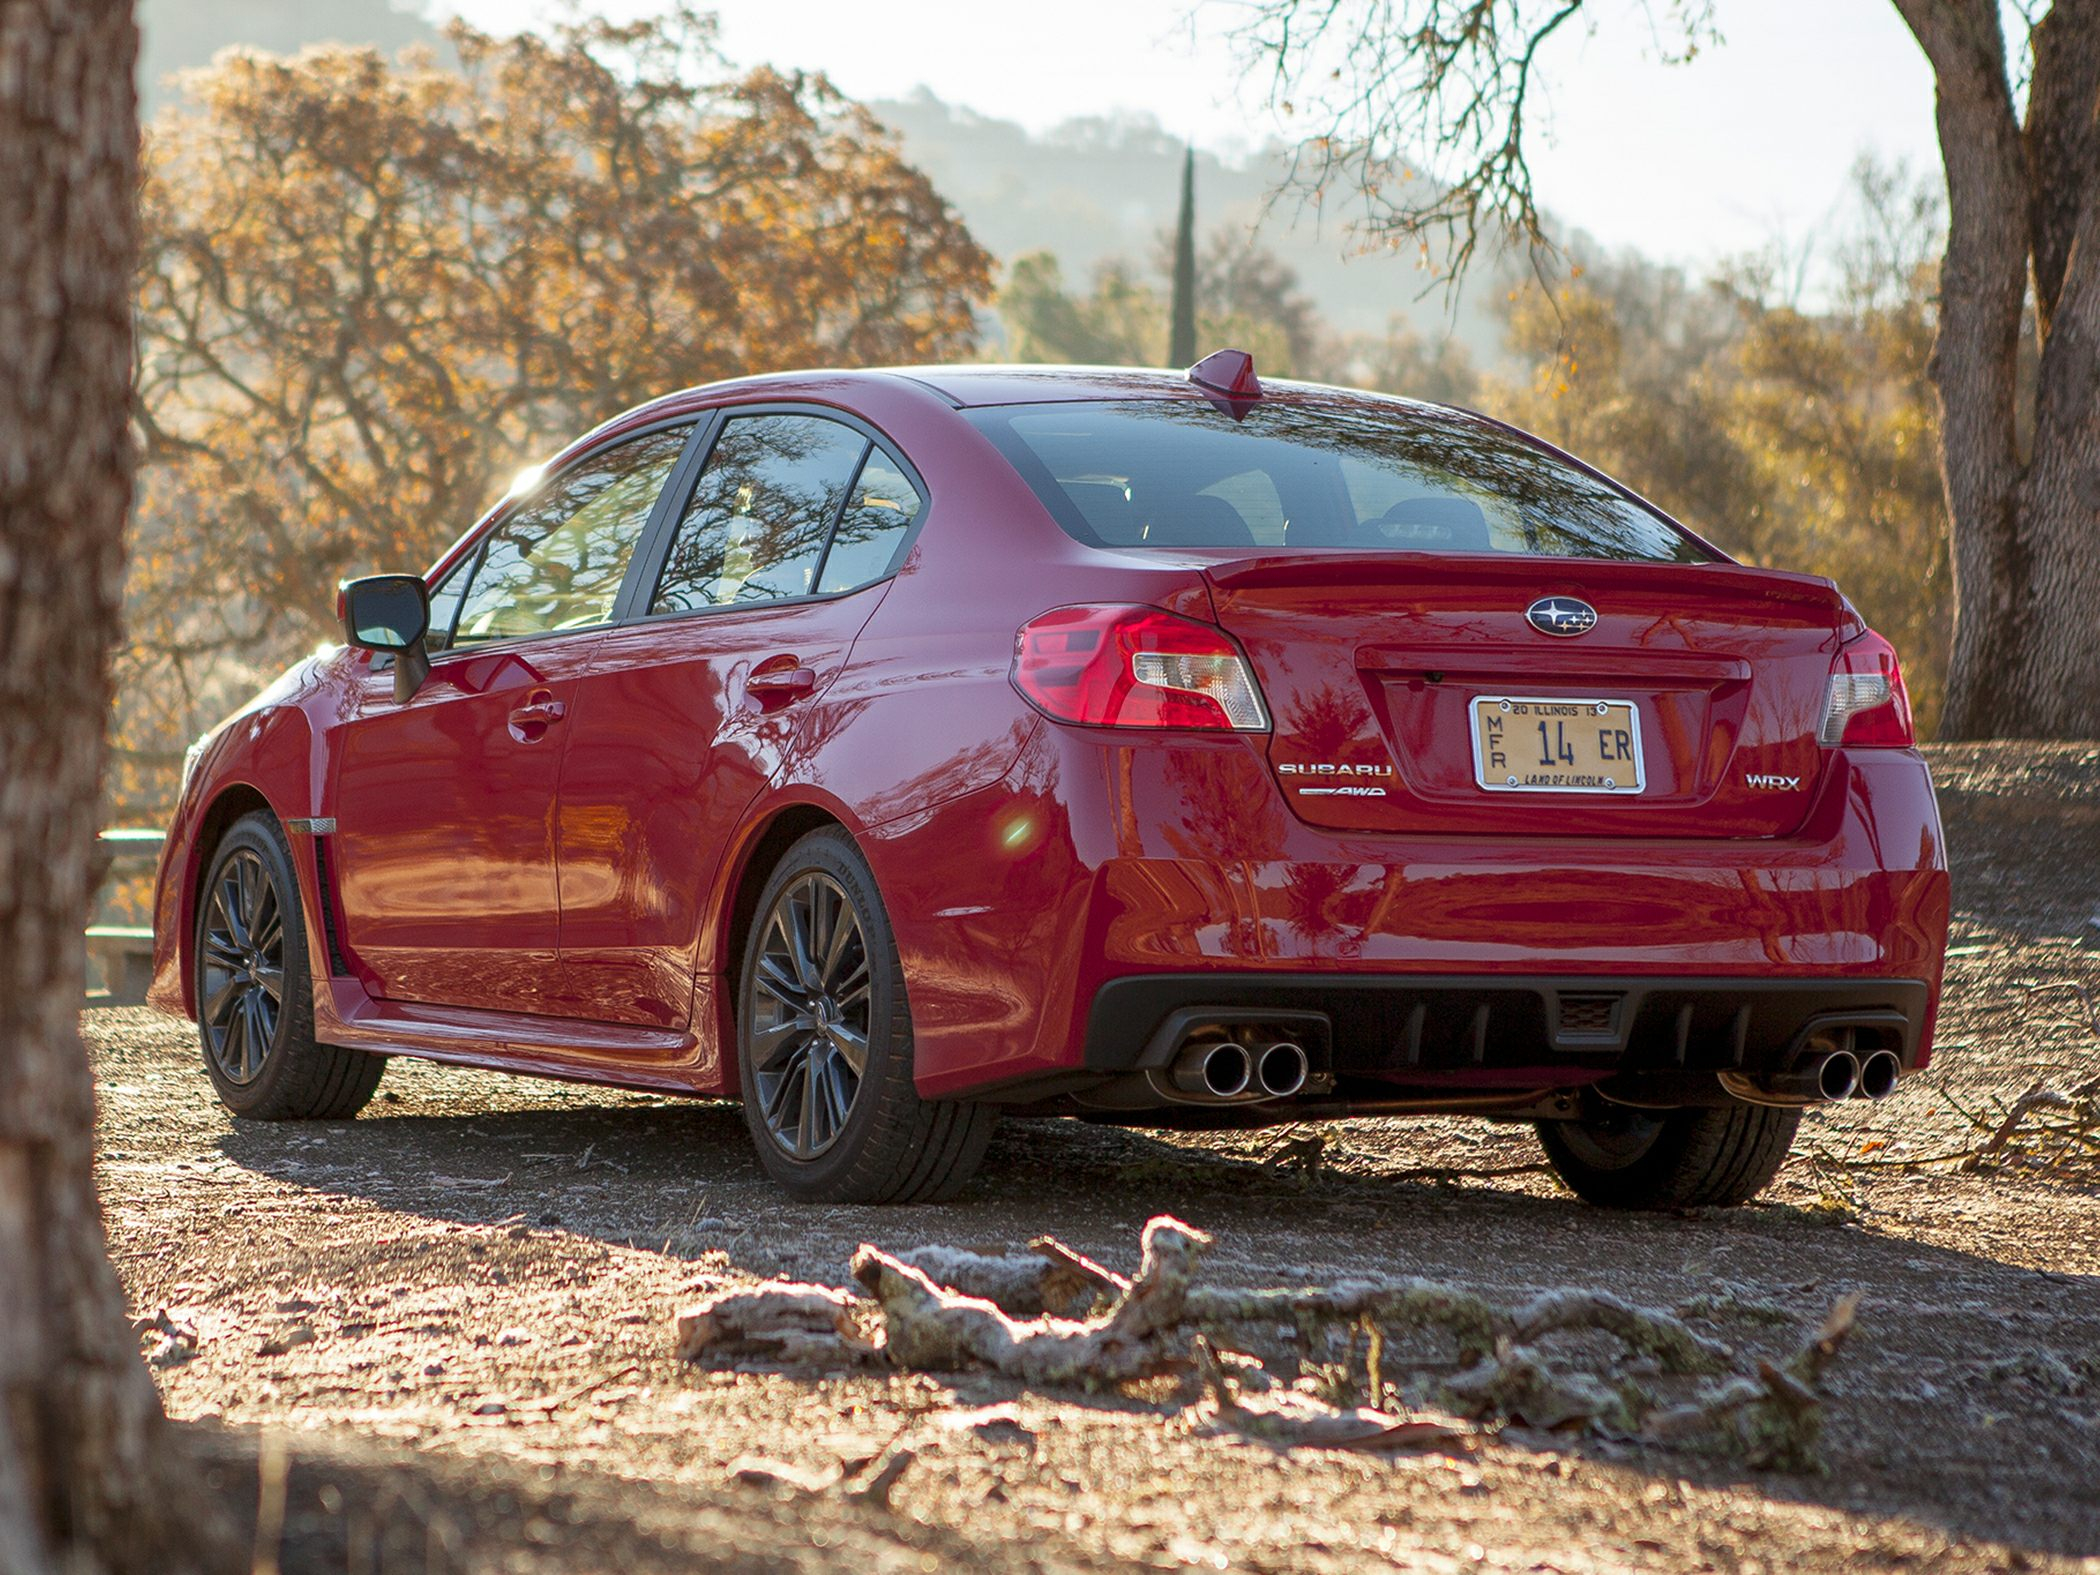 2015 Subaru WRX Rear